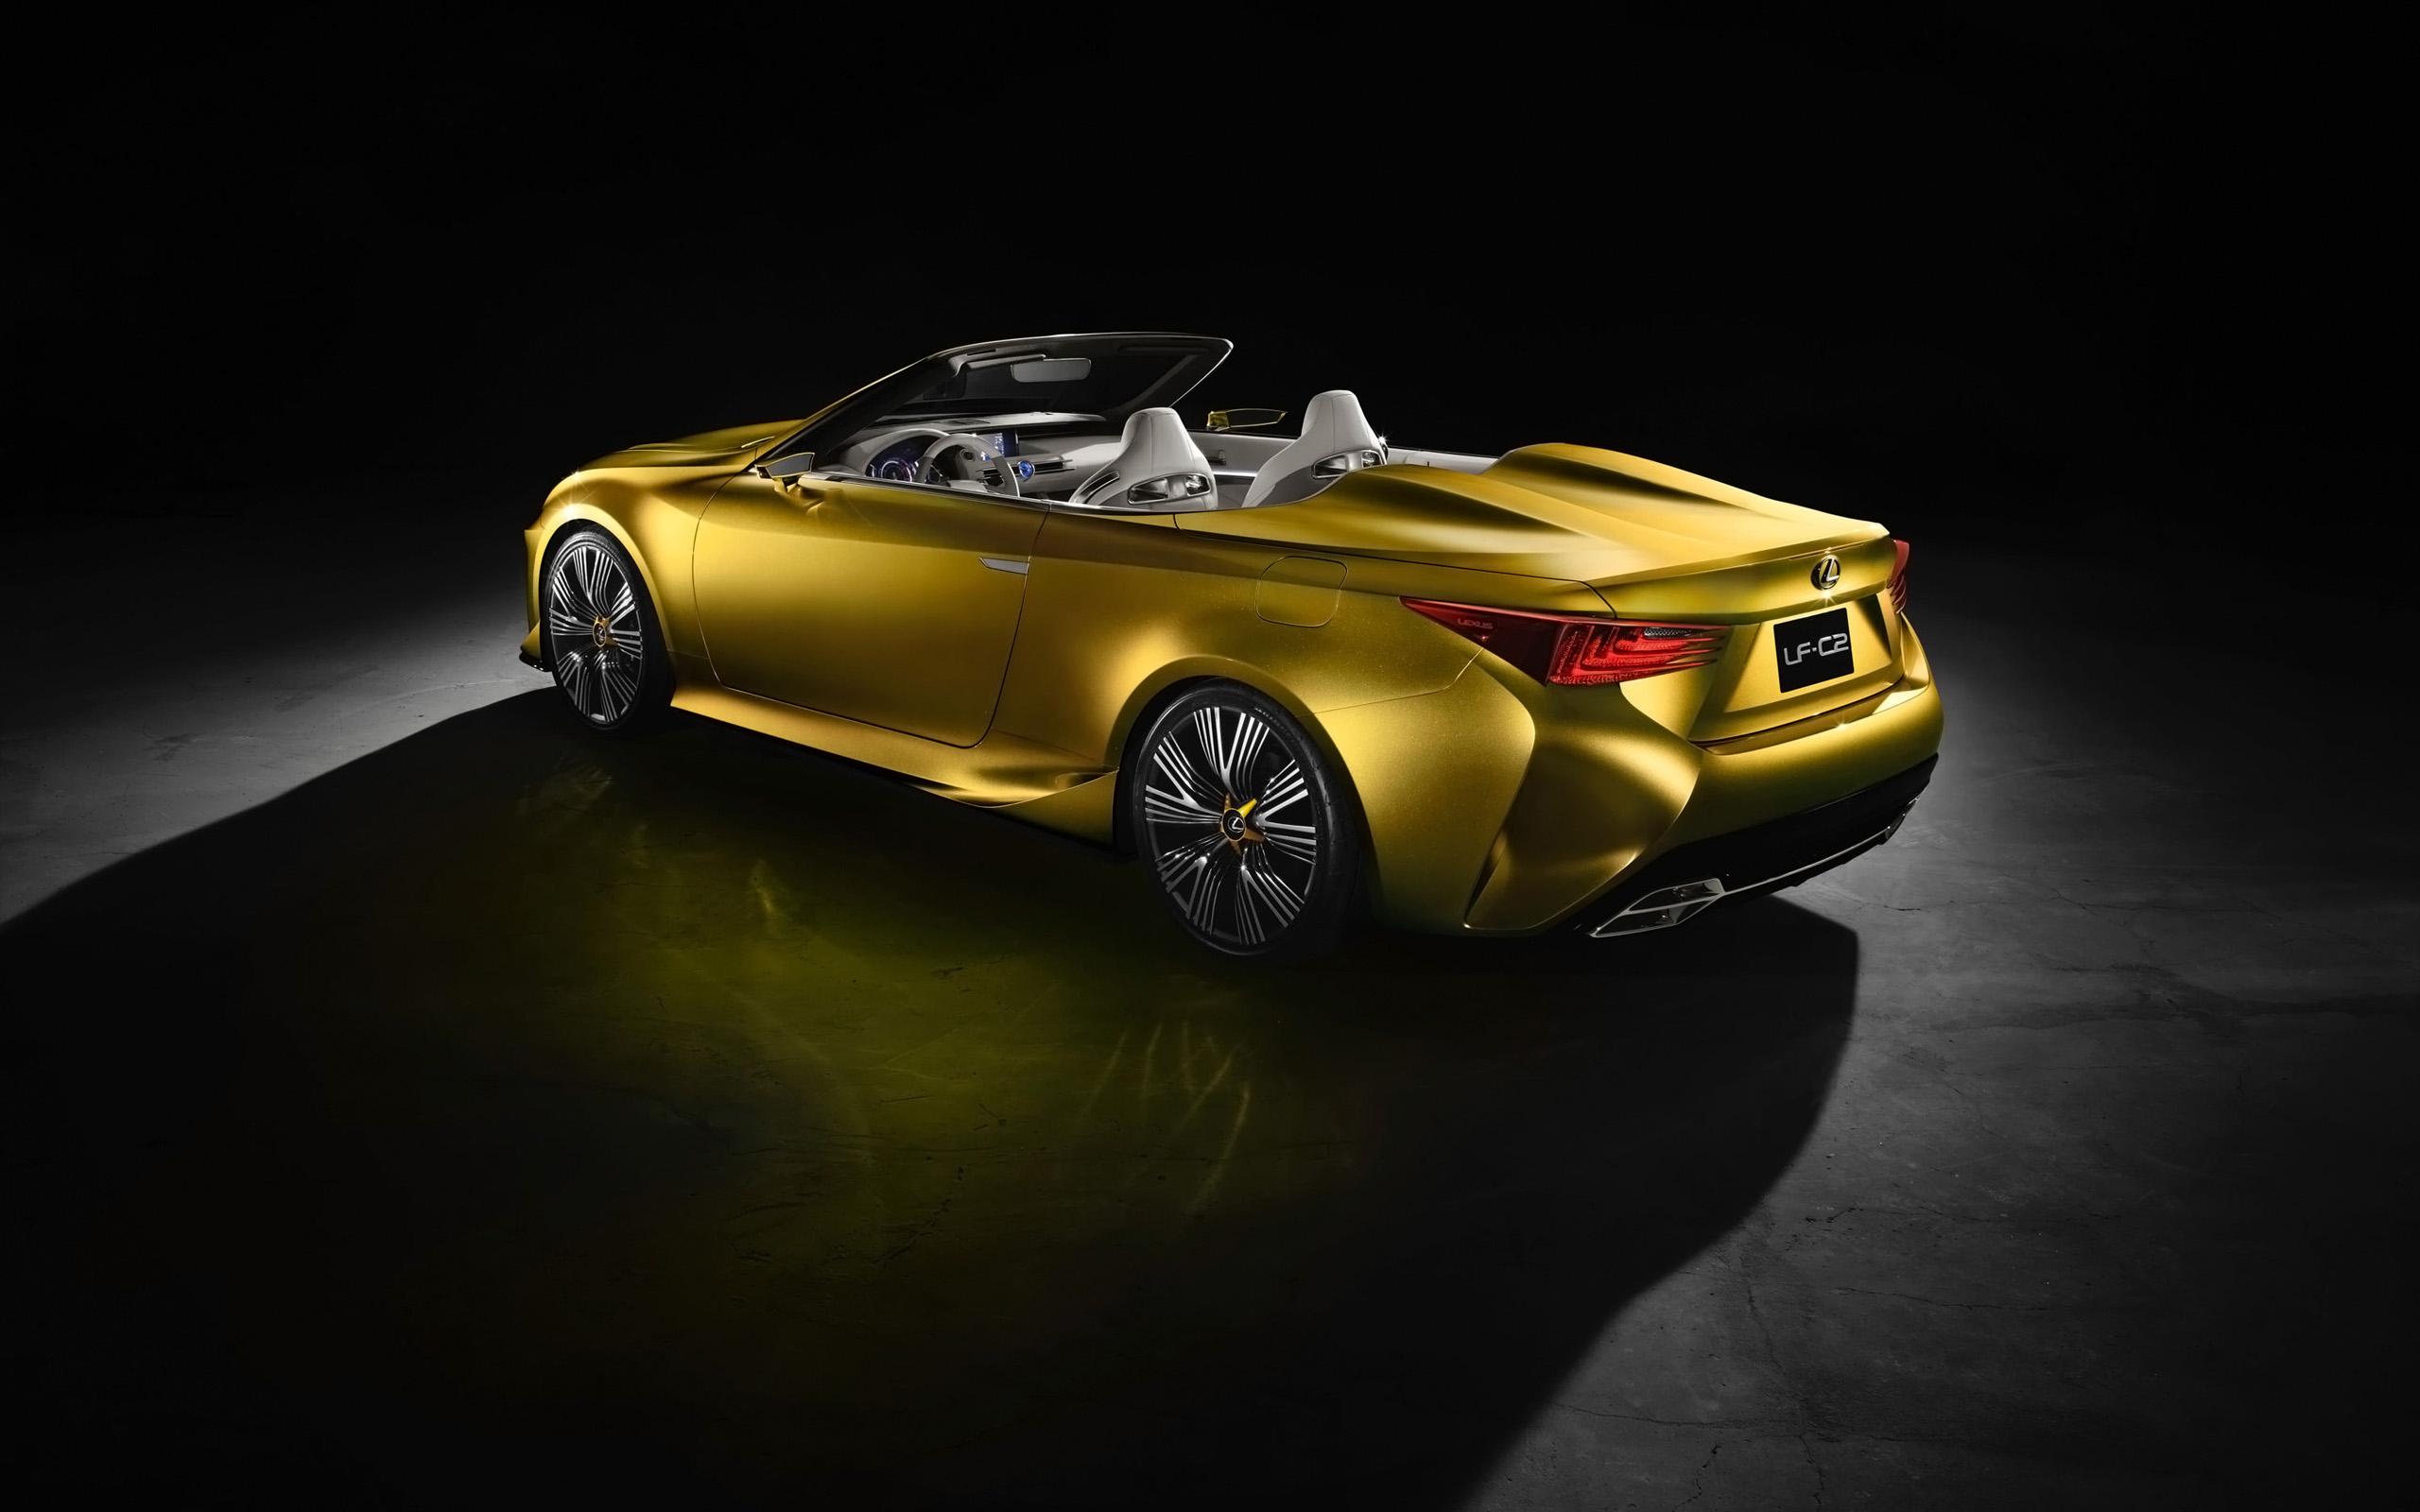 2014 Lexus LF C2 Concept 2 Wallpaper | HD Car Wallpapers | ID #4965